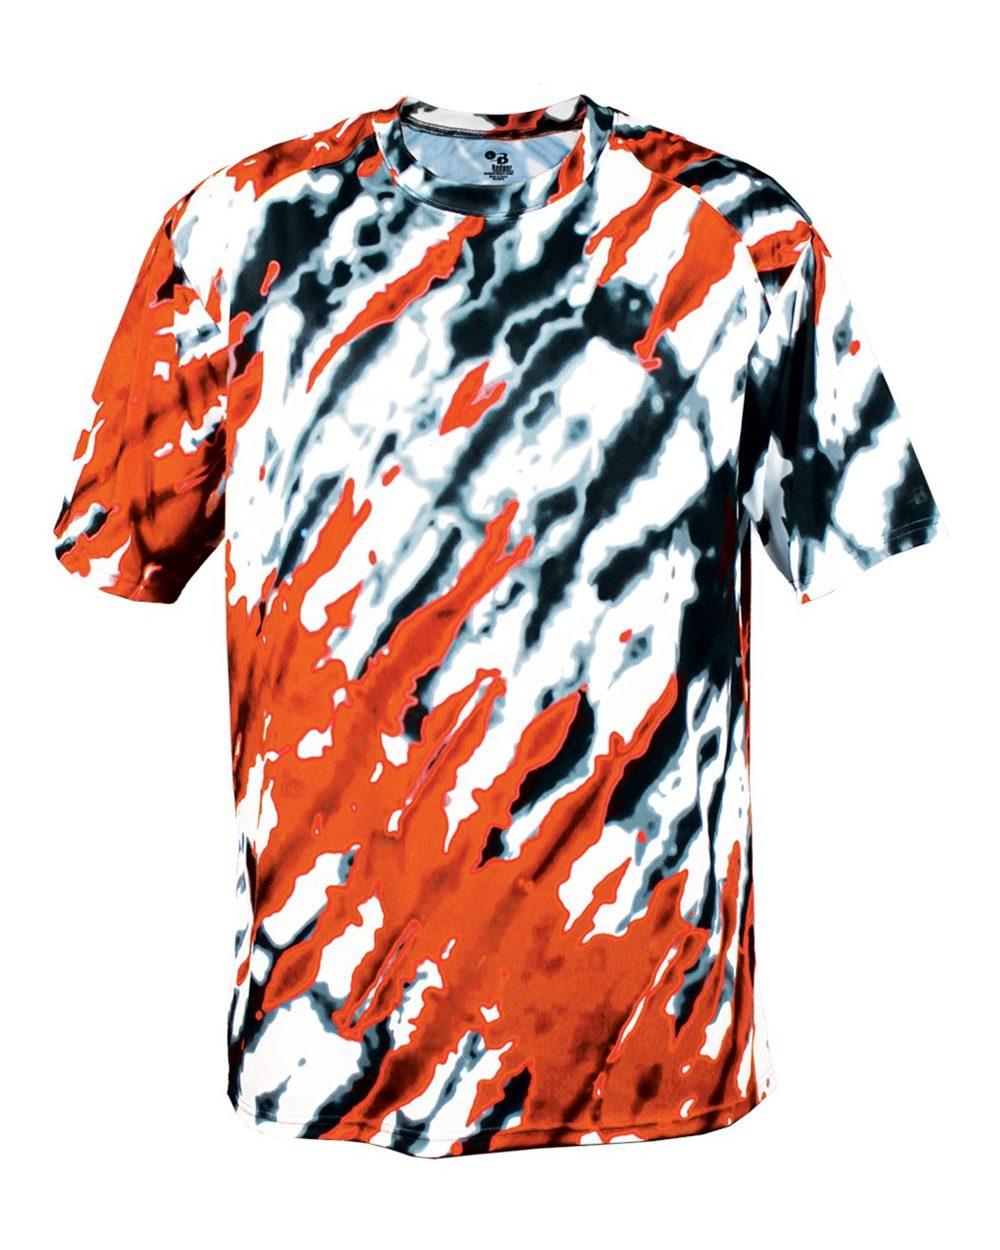 Badger 2182 - Youth Tie Dri Short-Sleeve T-Shirt